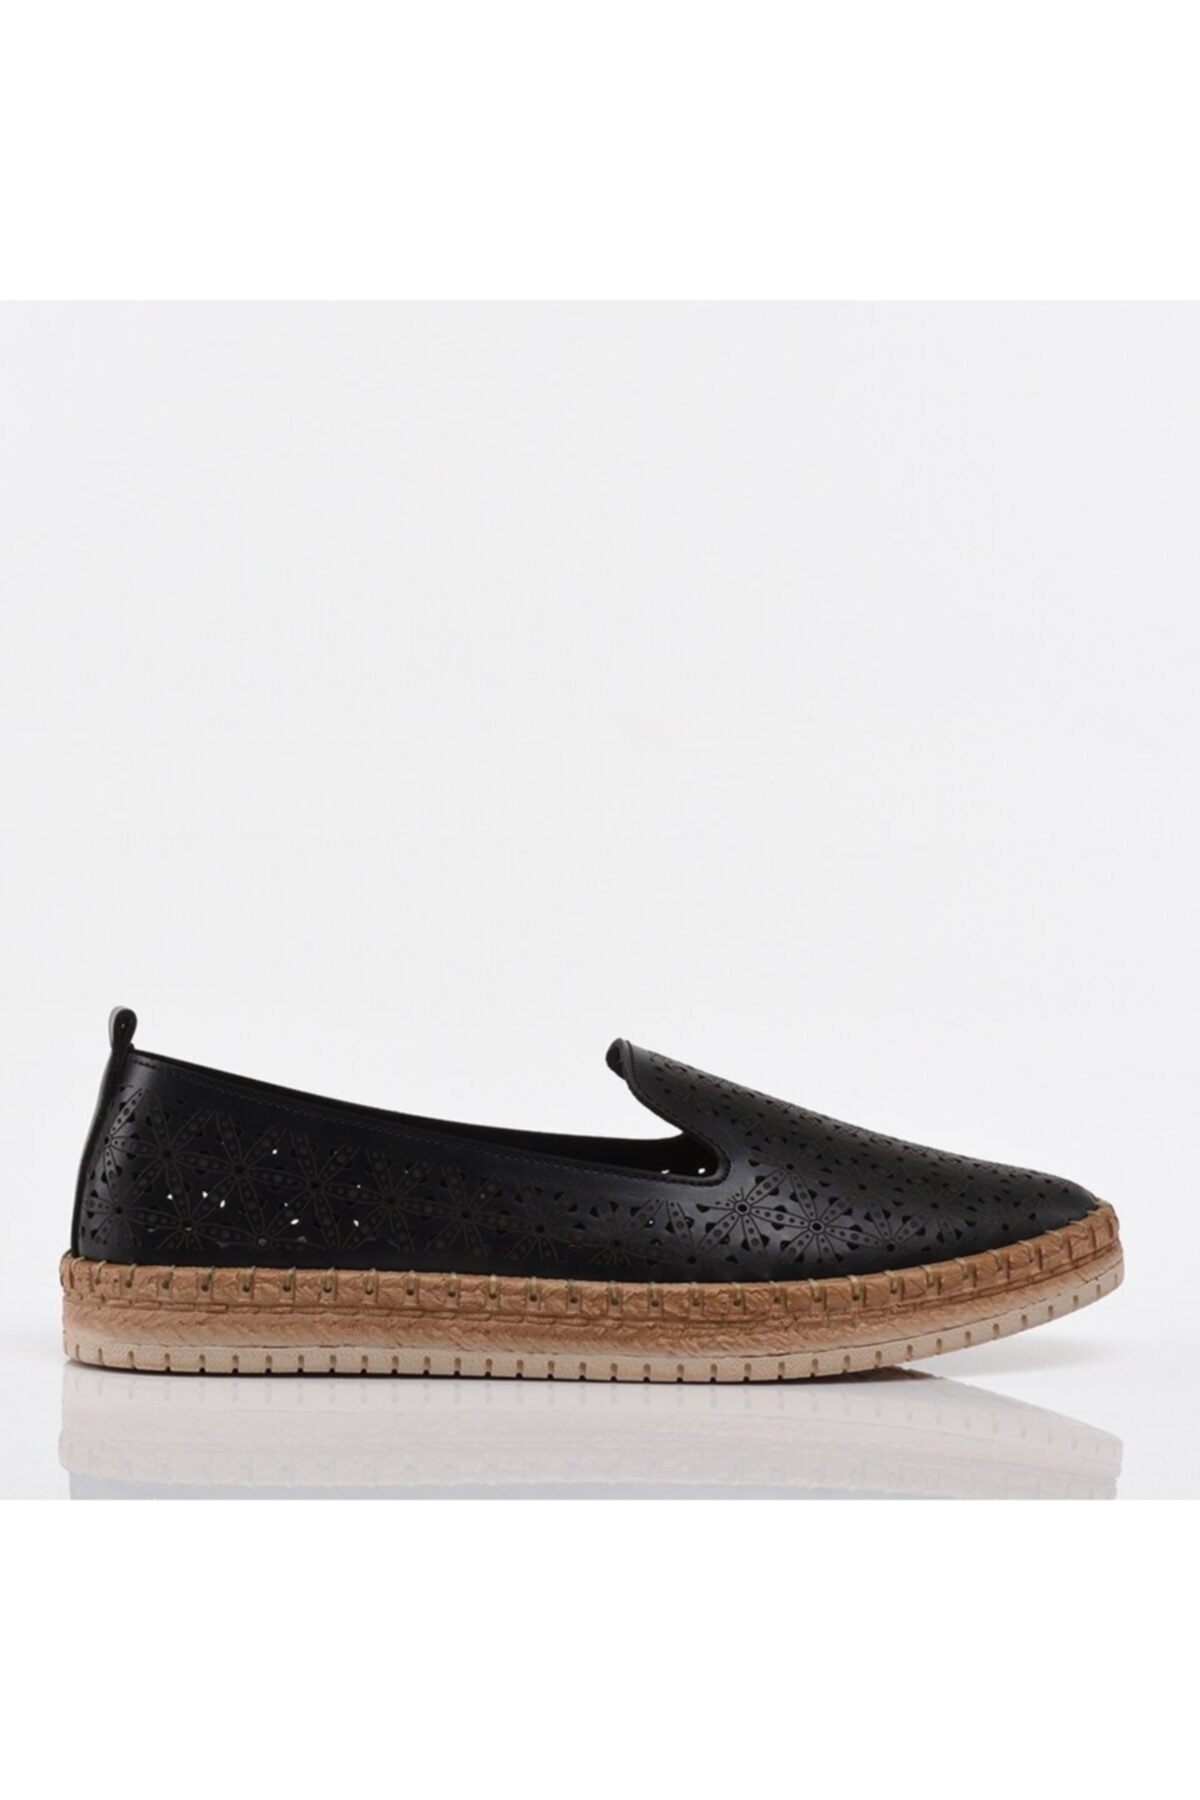 کفش تخت شیک زنانه برند هاتیچ رنگ مشکی کد ty96041936